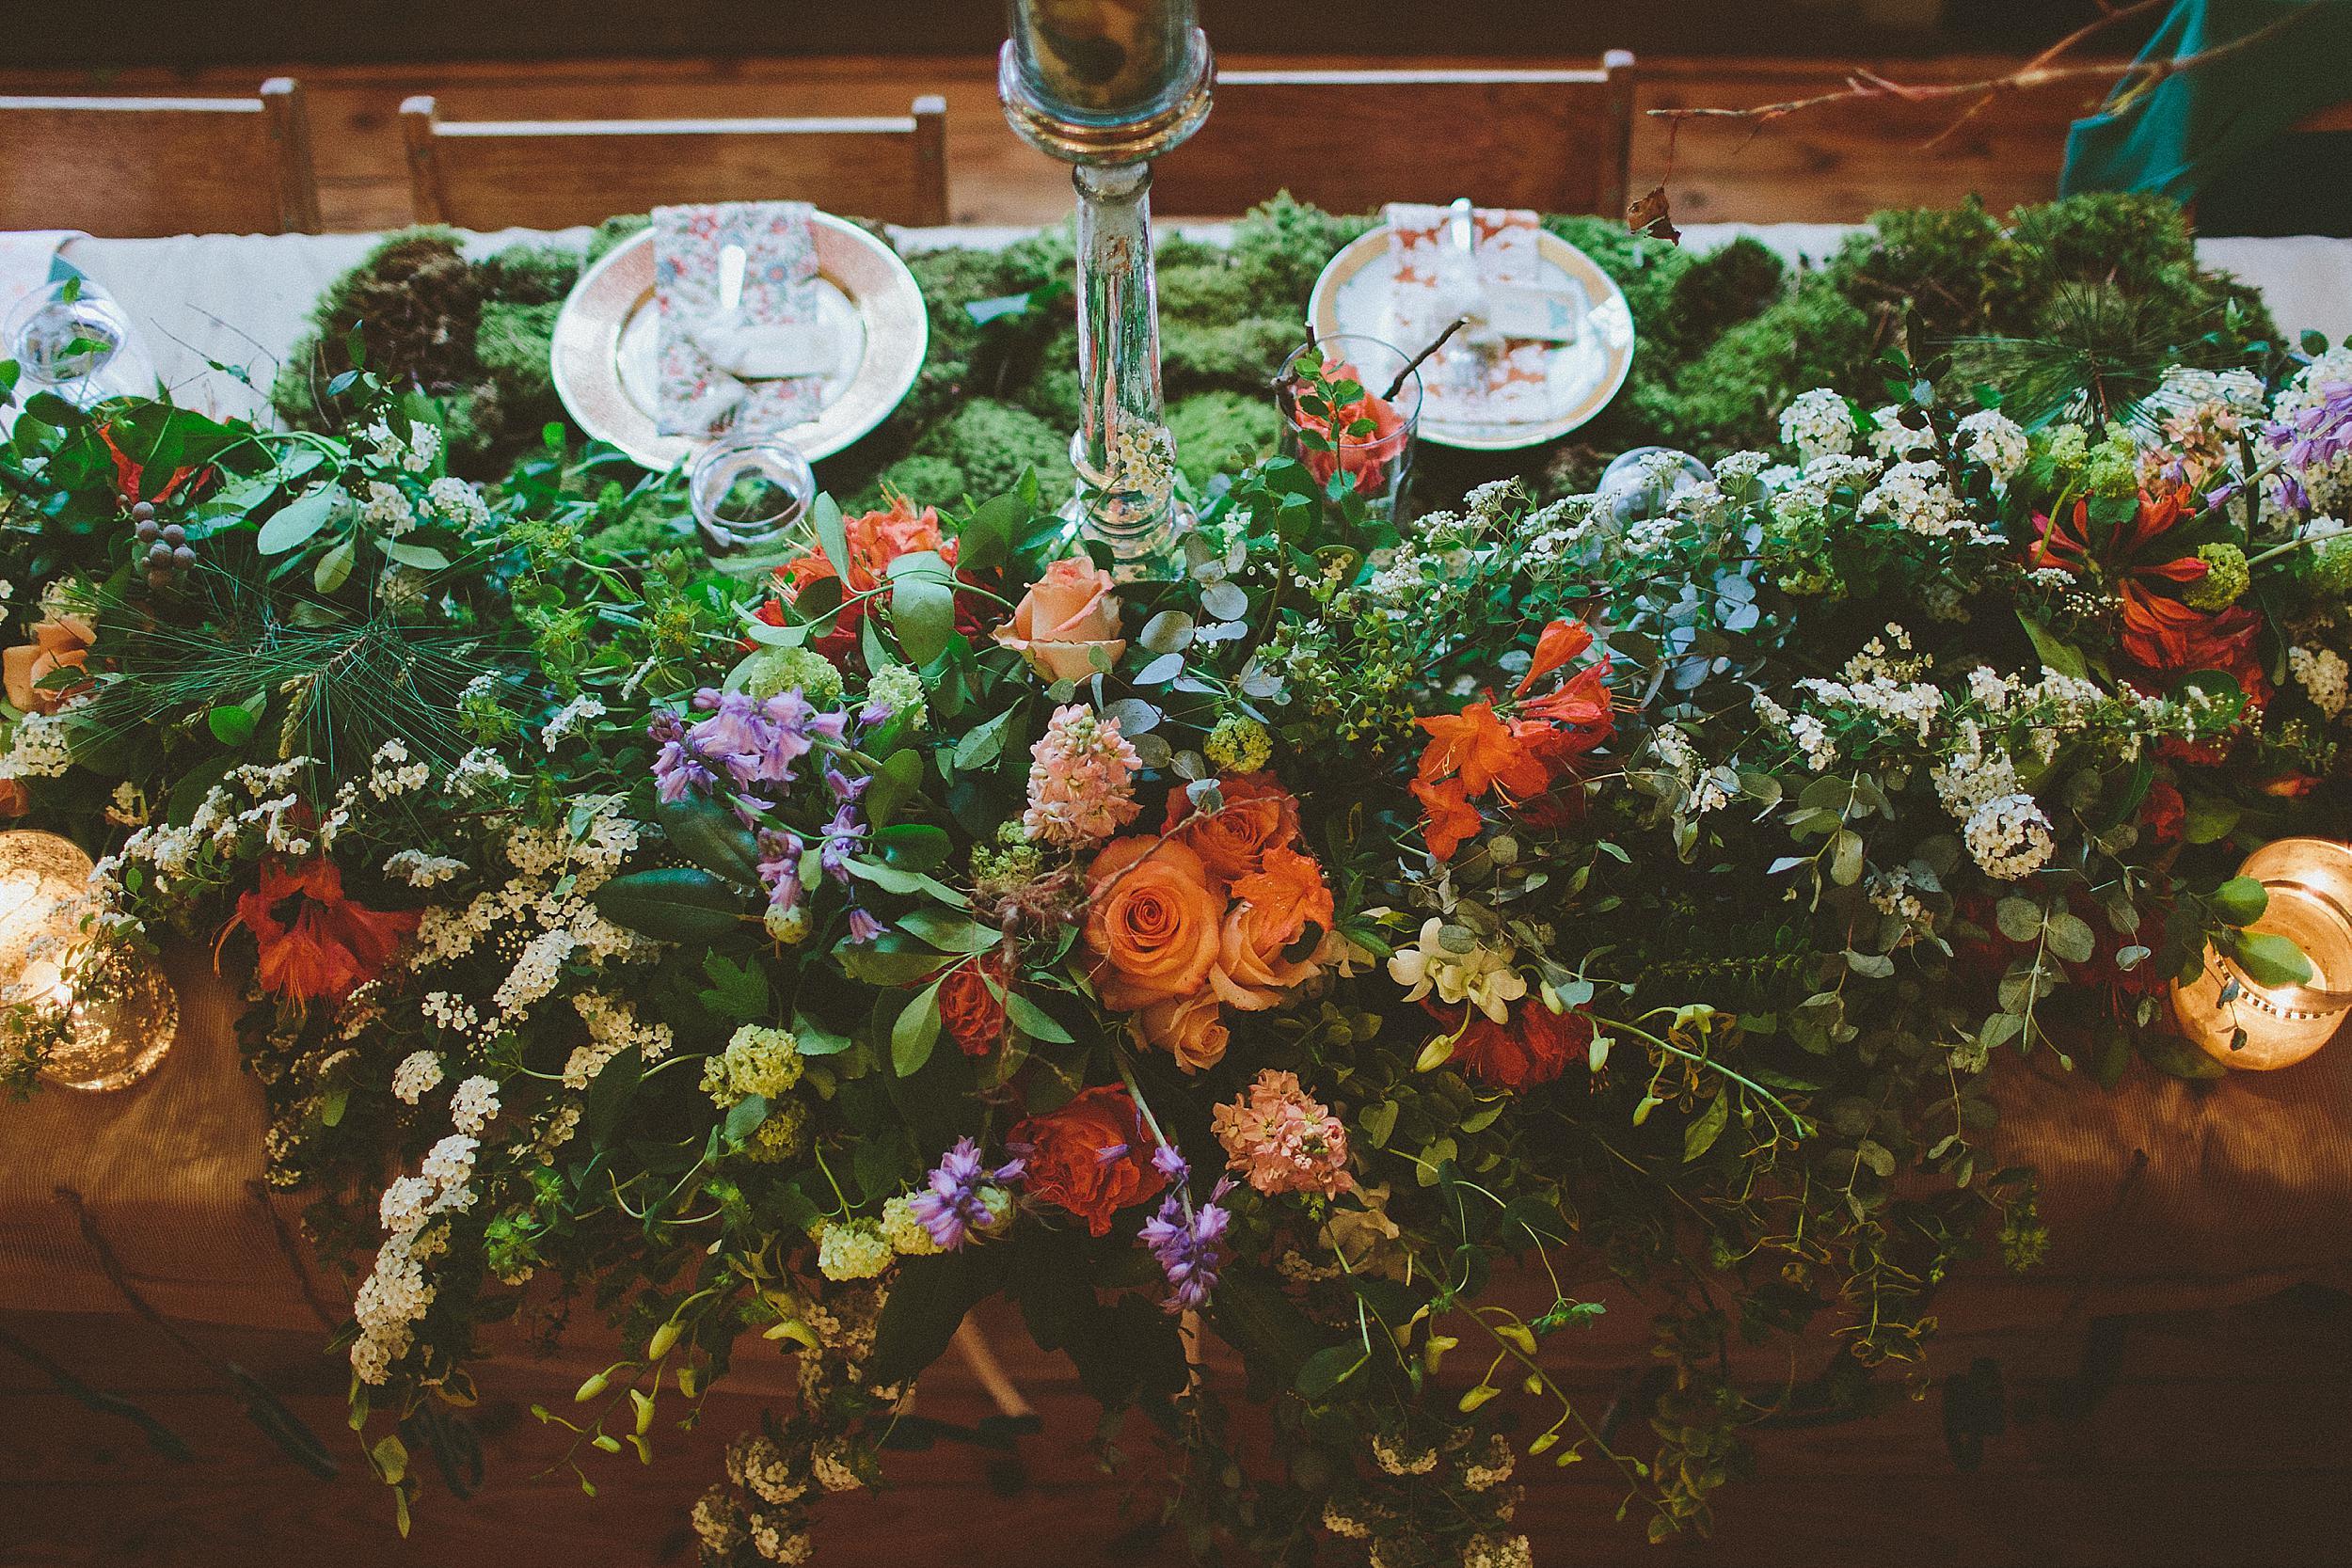 tara_jason_wedding_landis_valley_museum_with_love_and_embers-211.JPG